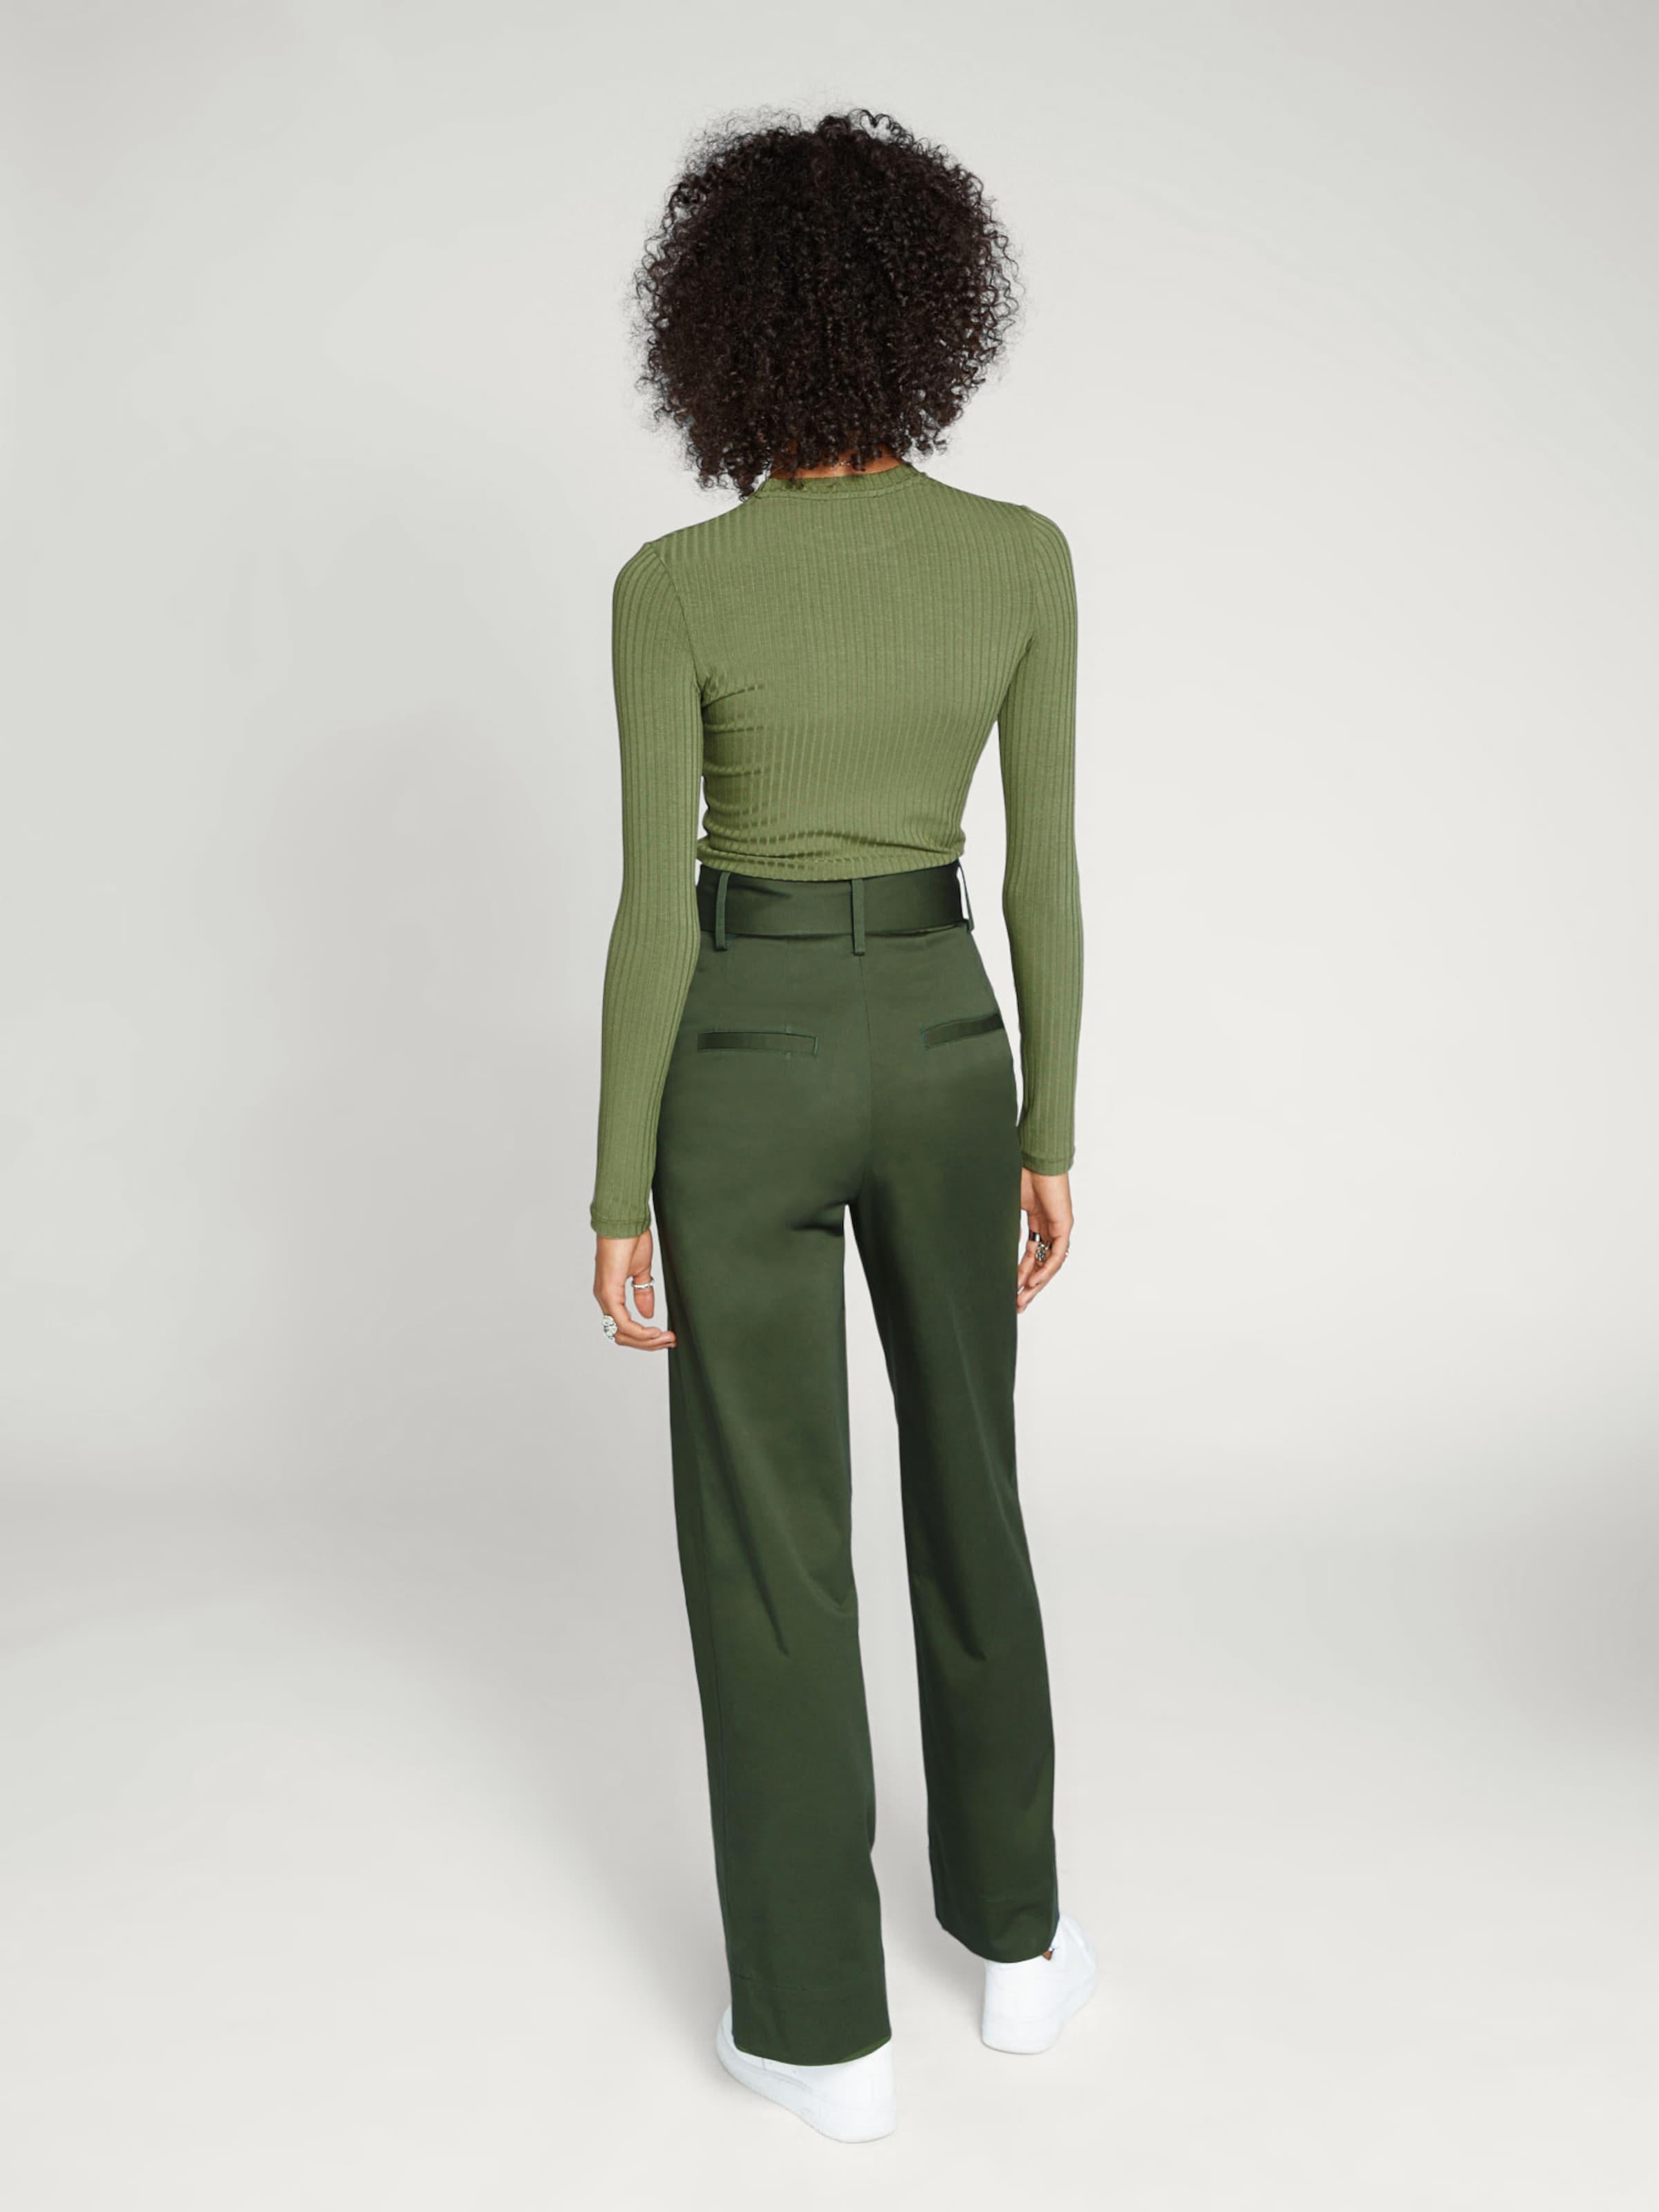 En Pantalon Edited 'olena' Vert 'olena' Edited Vert En Pantalon 2WHeD9YEI